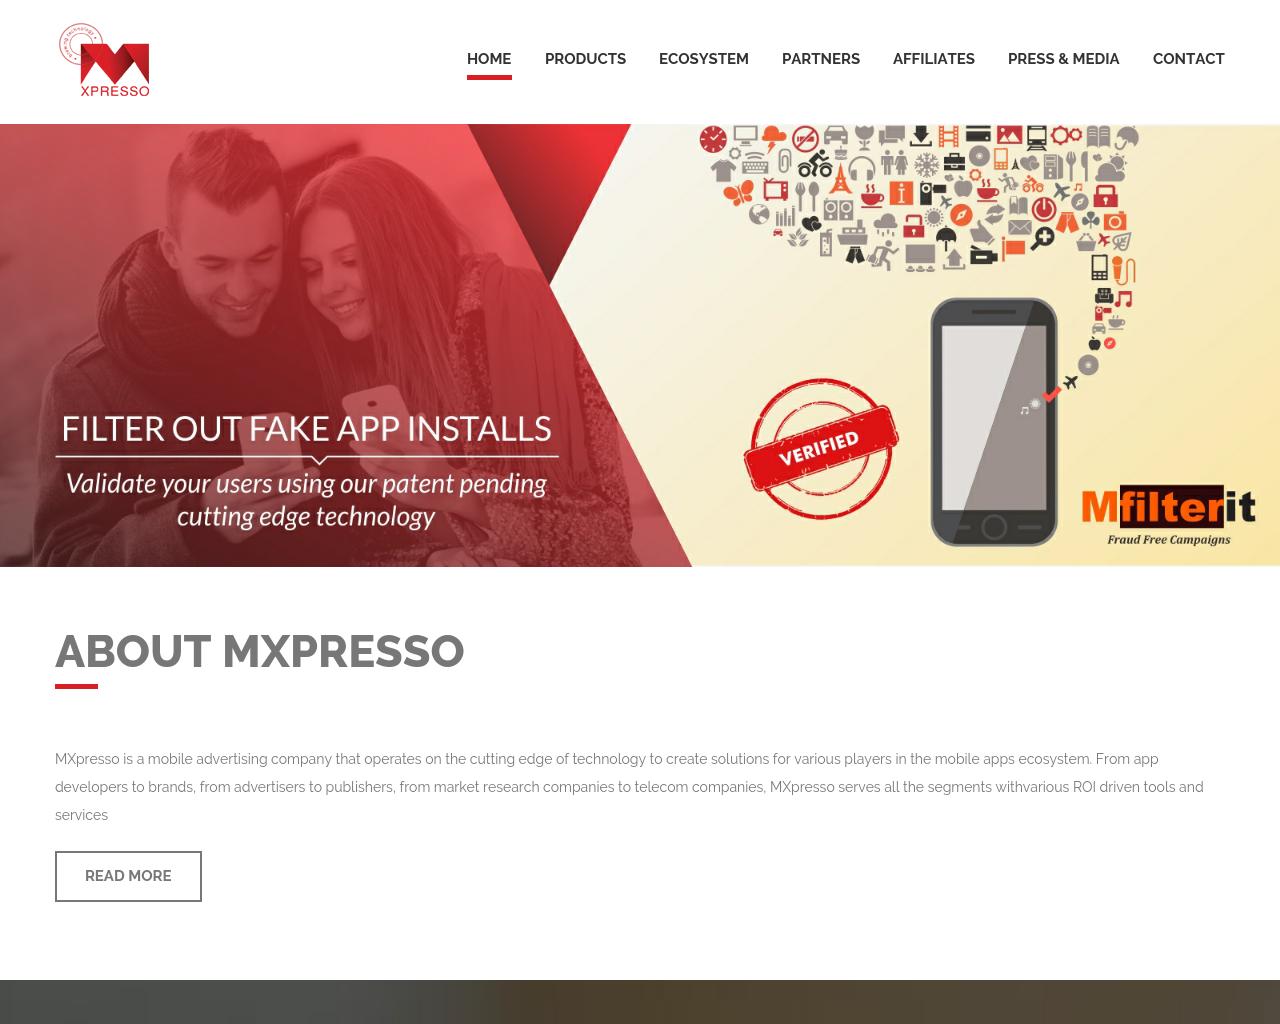 Mxpresso-Advertising-Reviews-Pricing